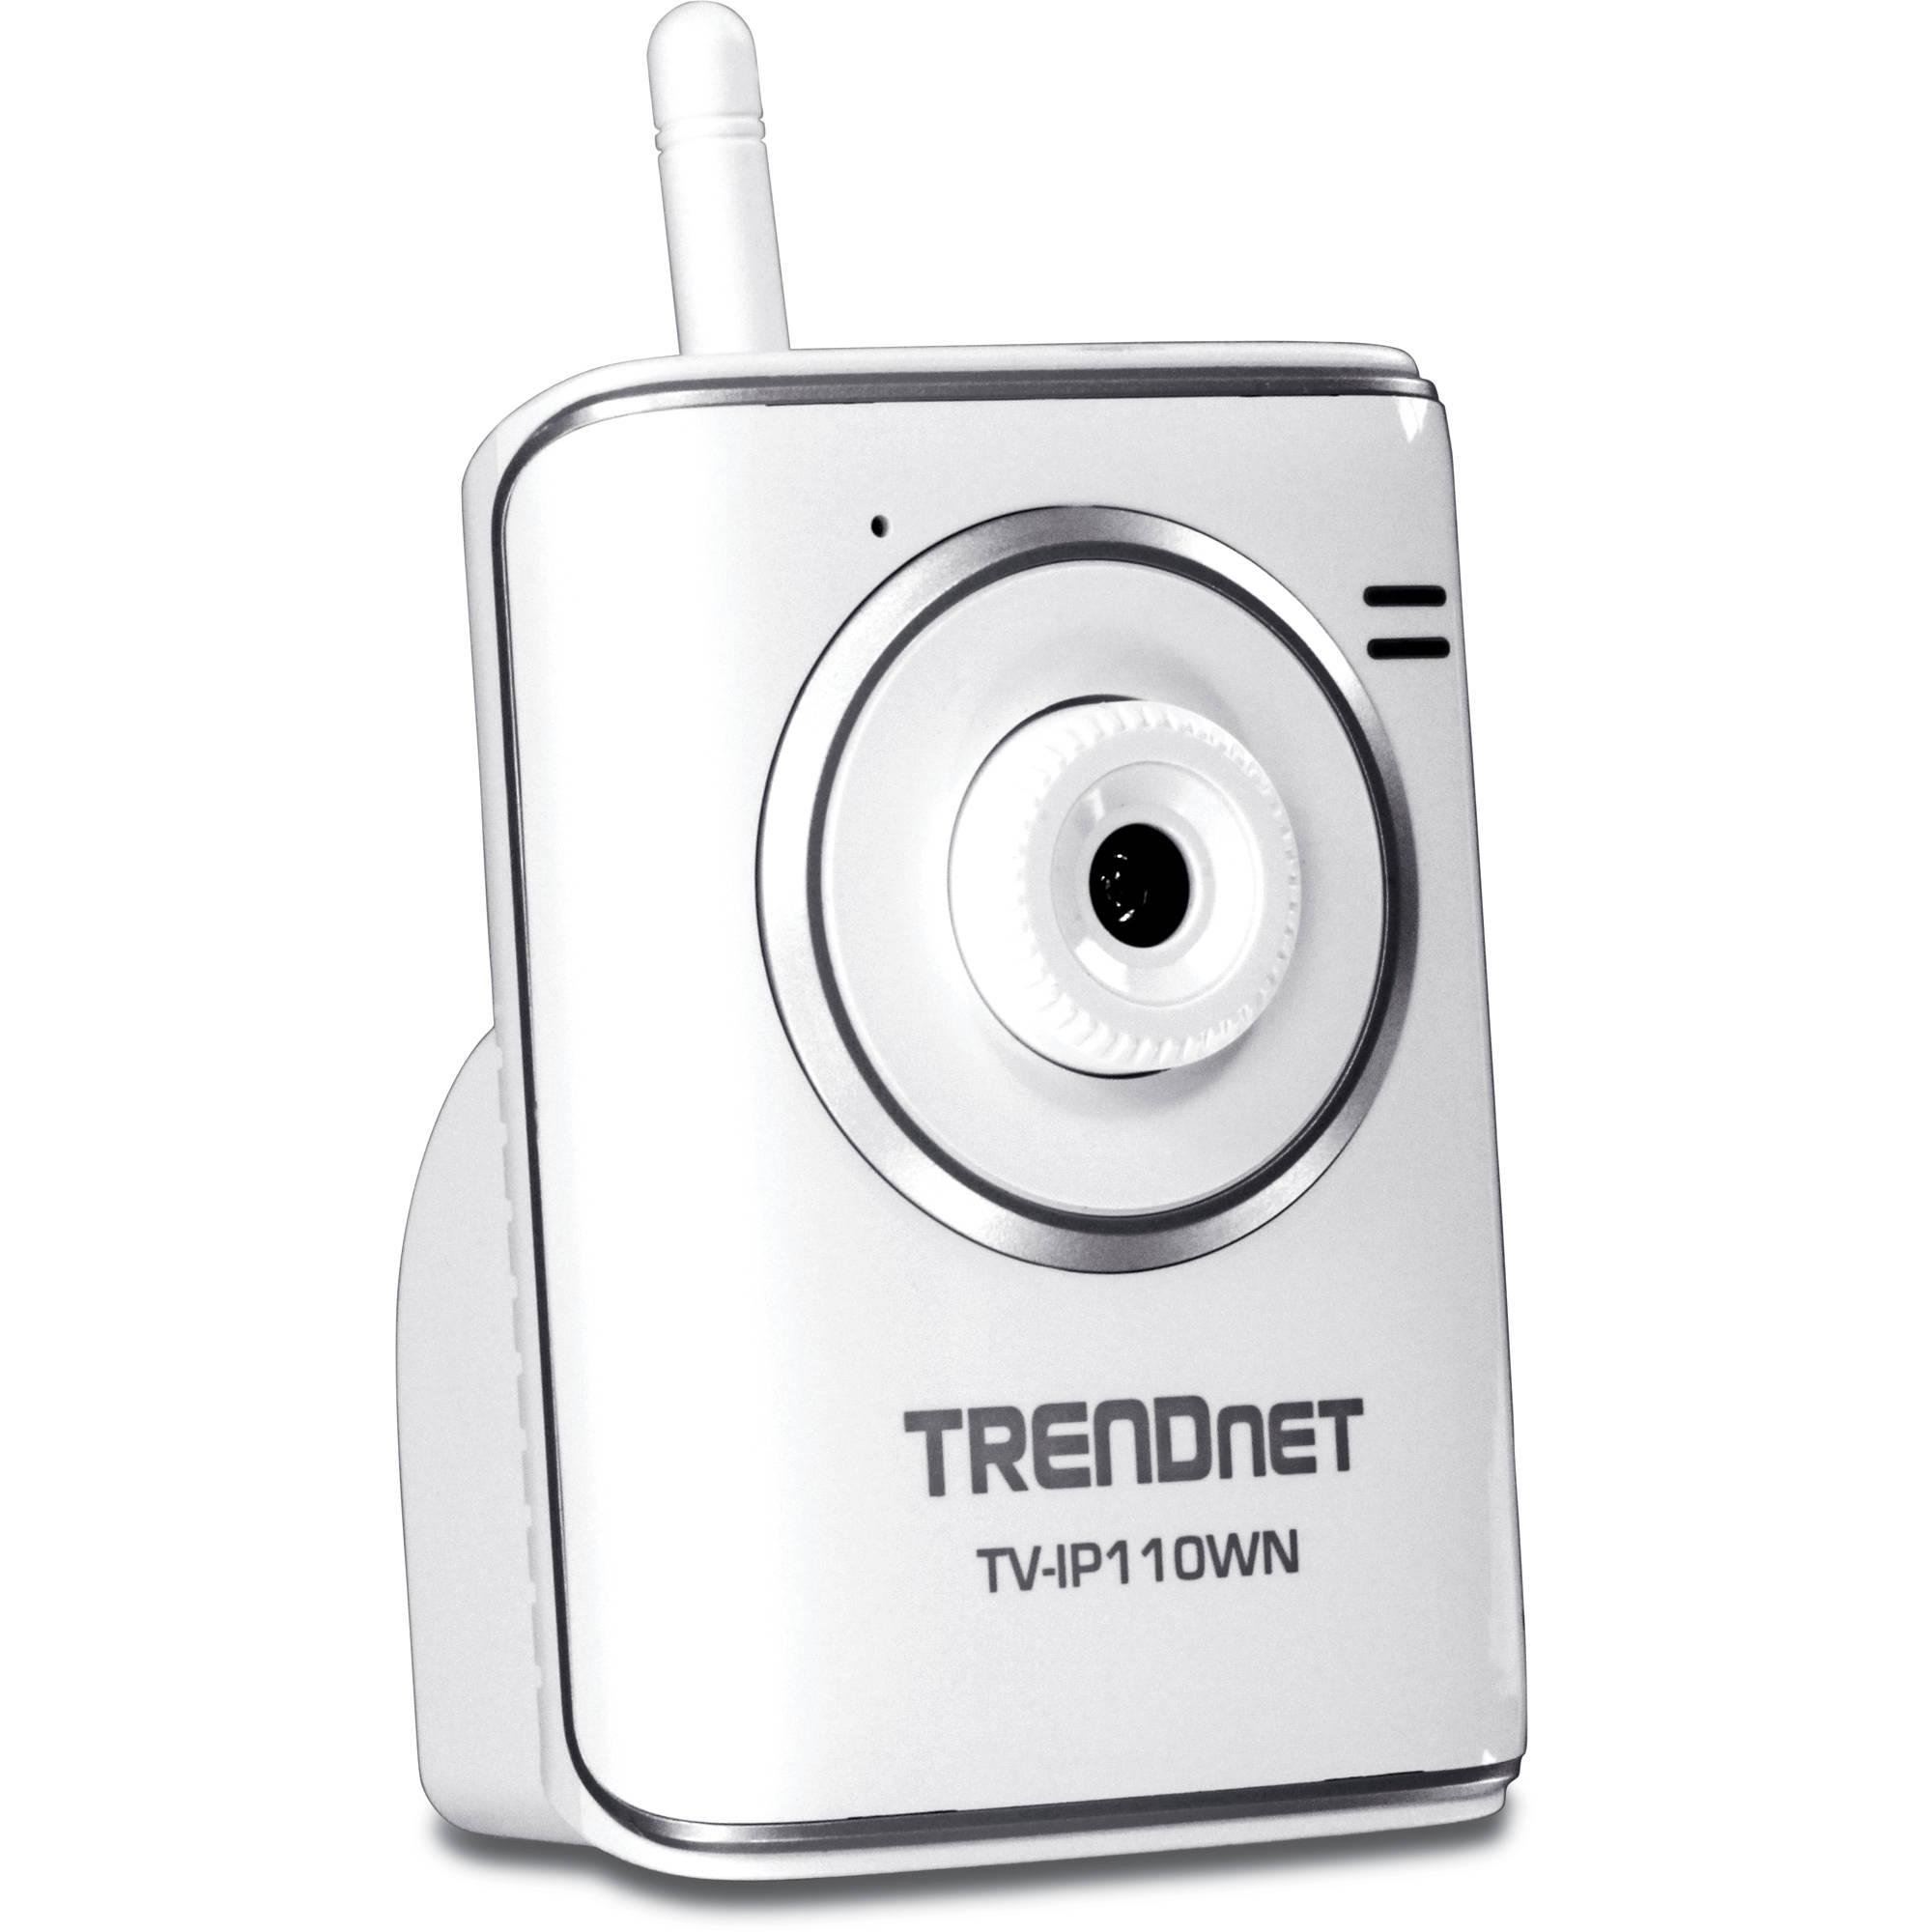 Trendnet tv ip110wn securview wireless n internet tv for Camera it web tv